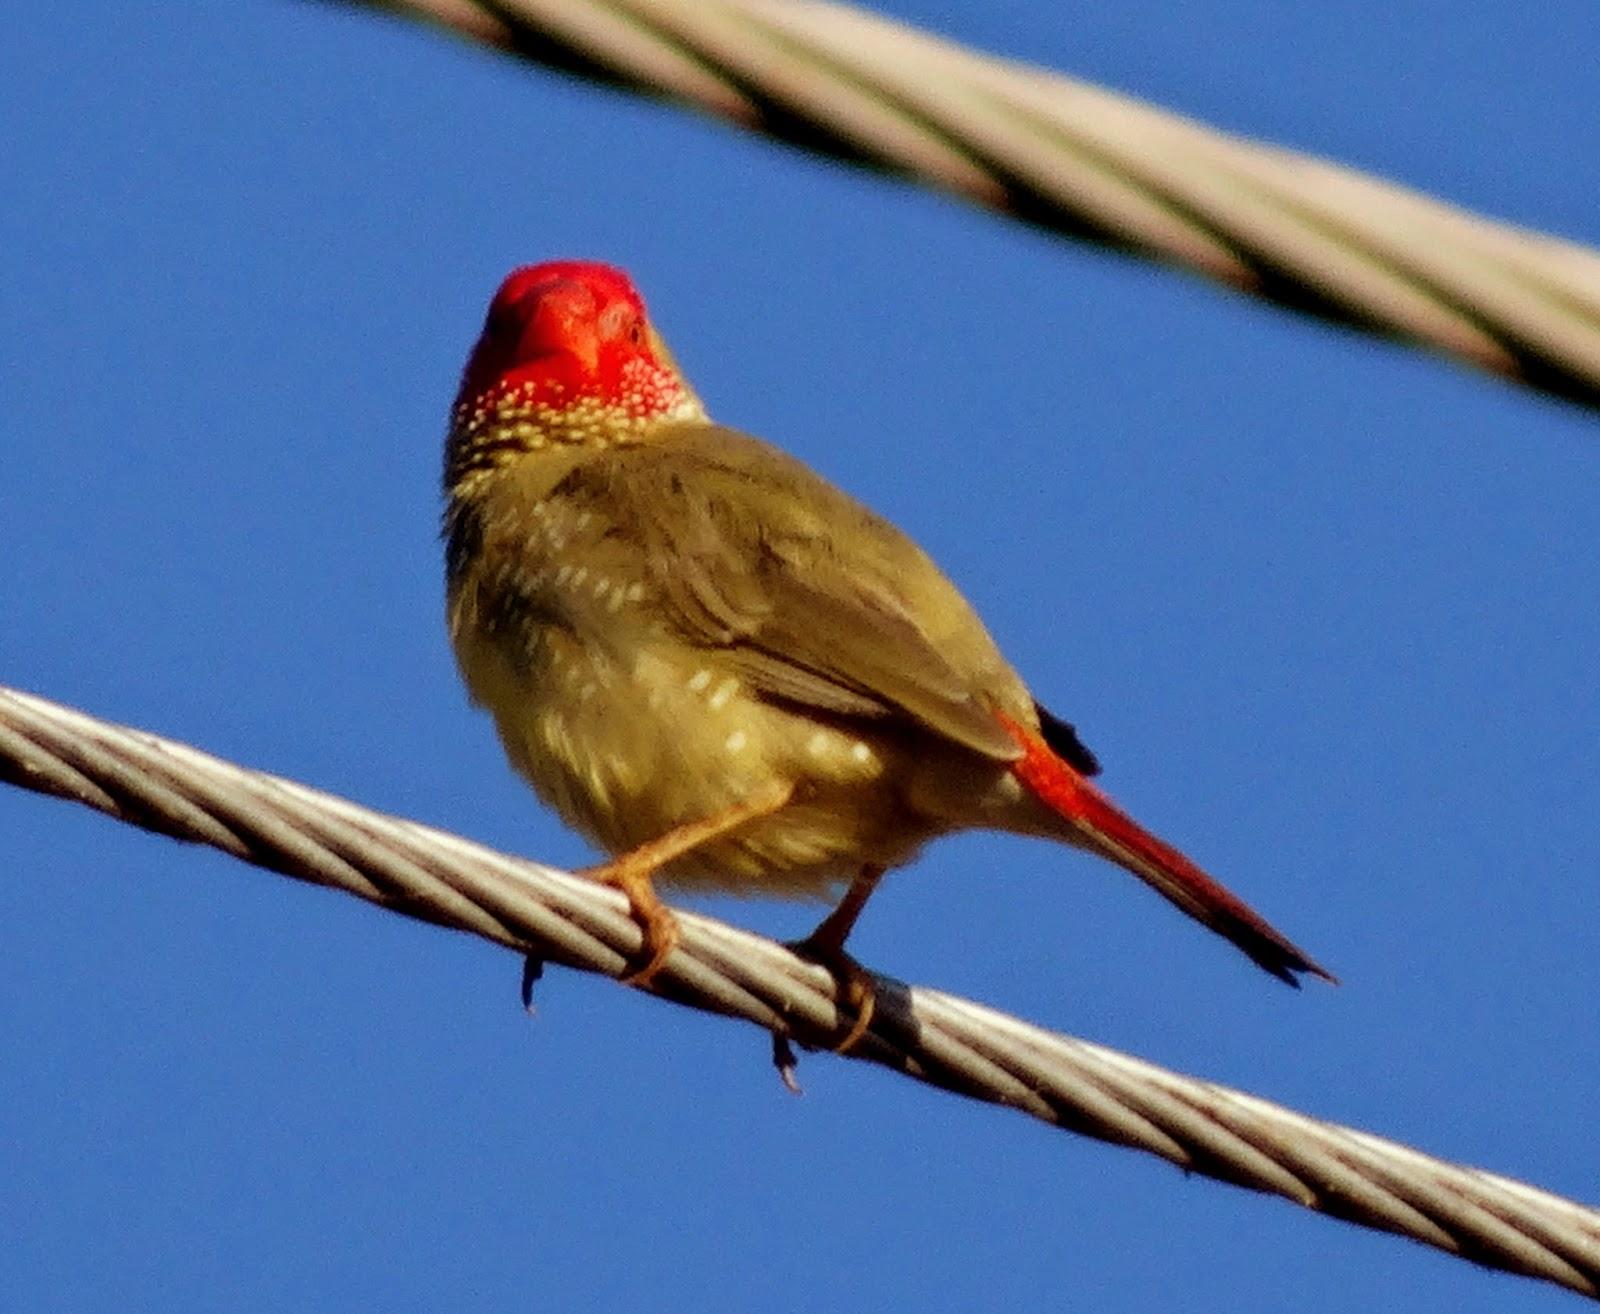 Yellow star finch - photo#12